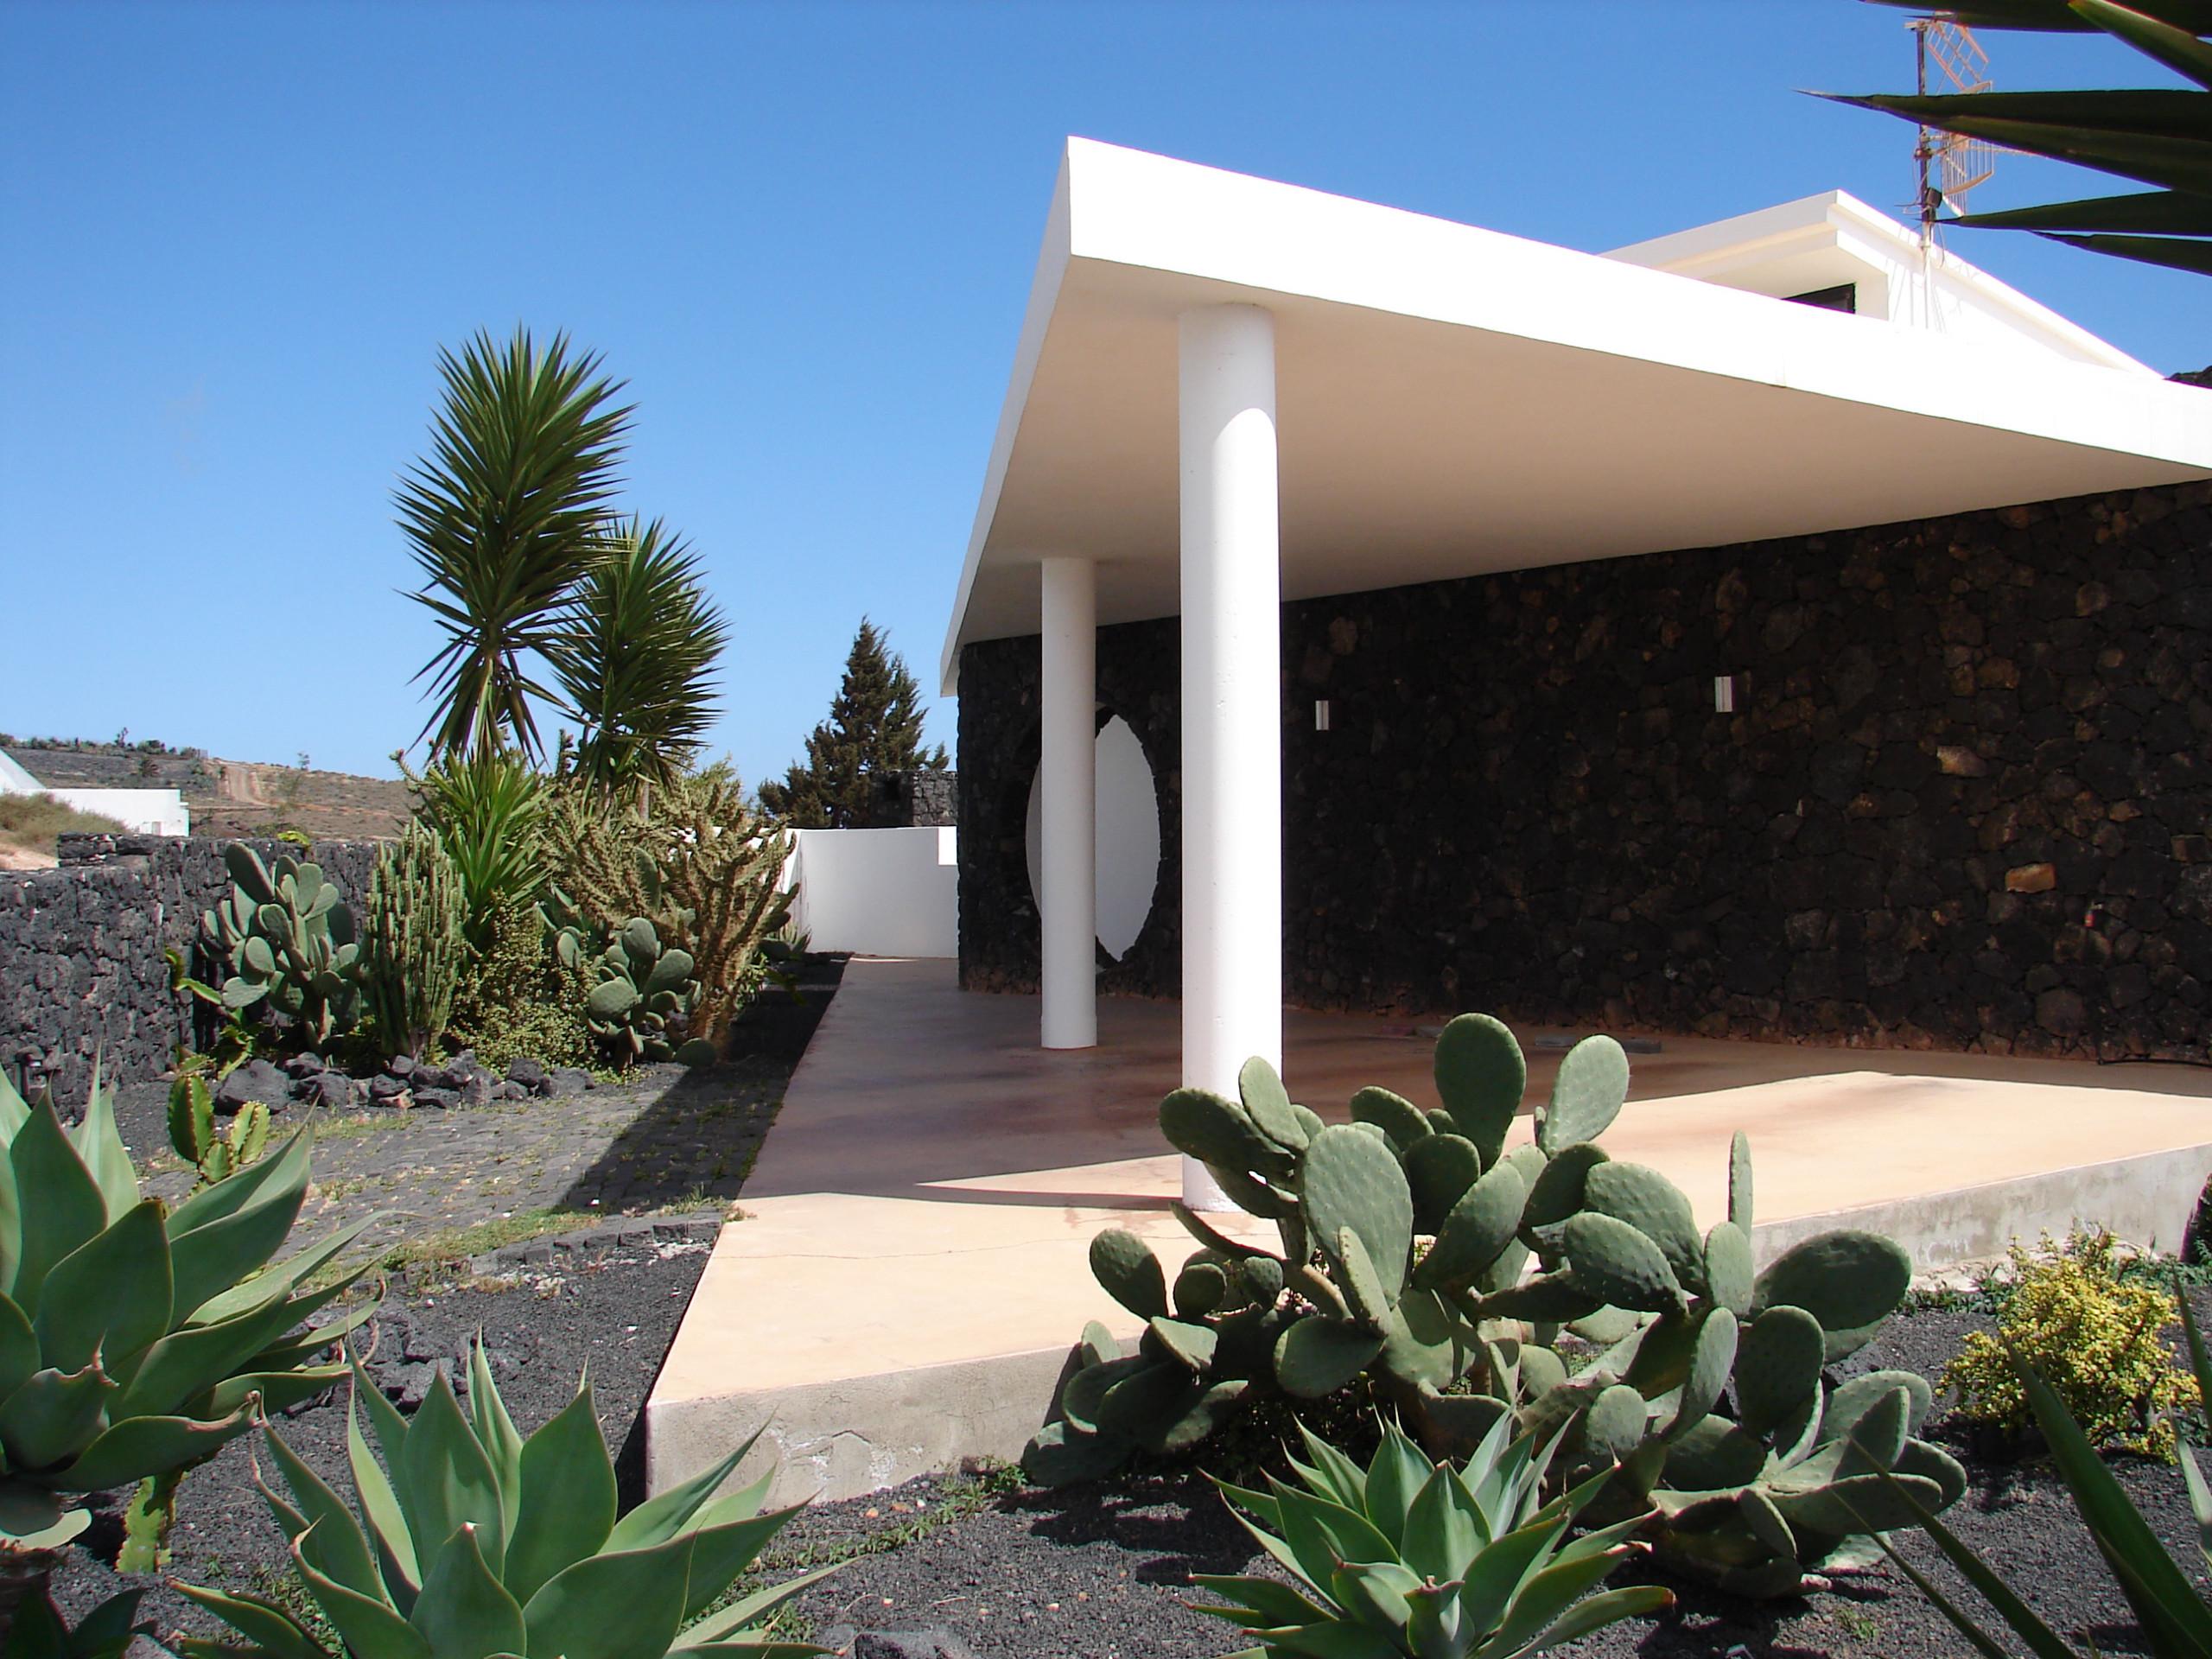 CASA ERIZO. TOP BEAUTIFUL HOUSES